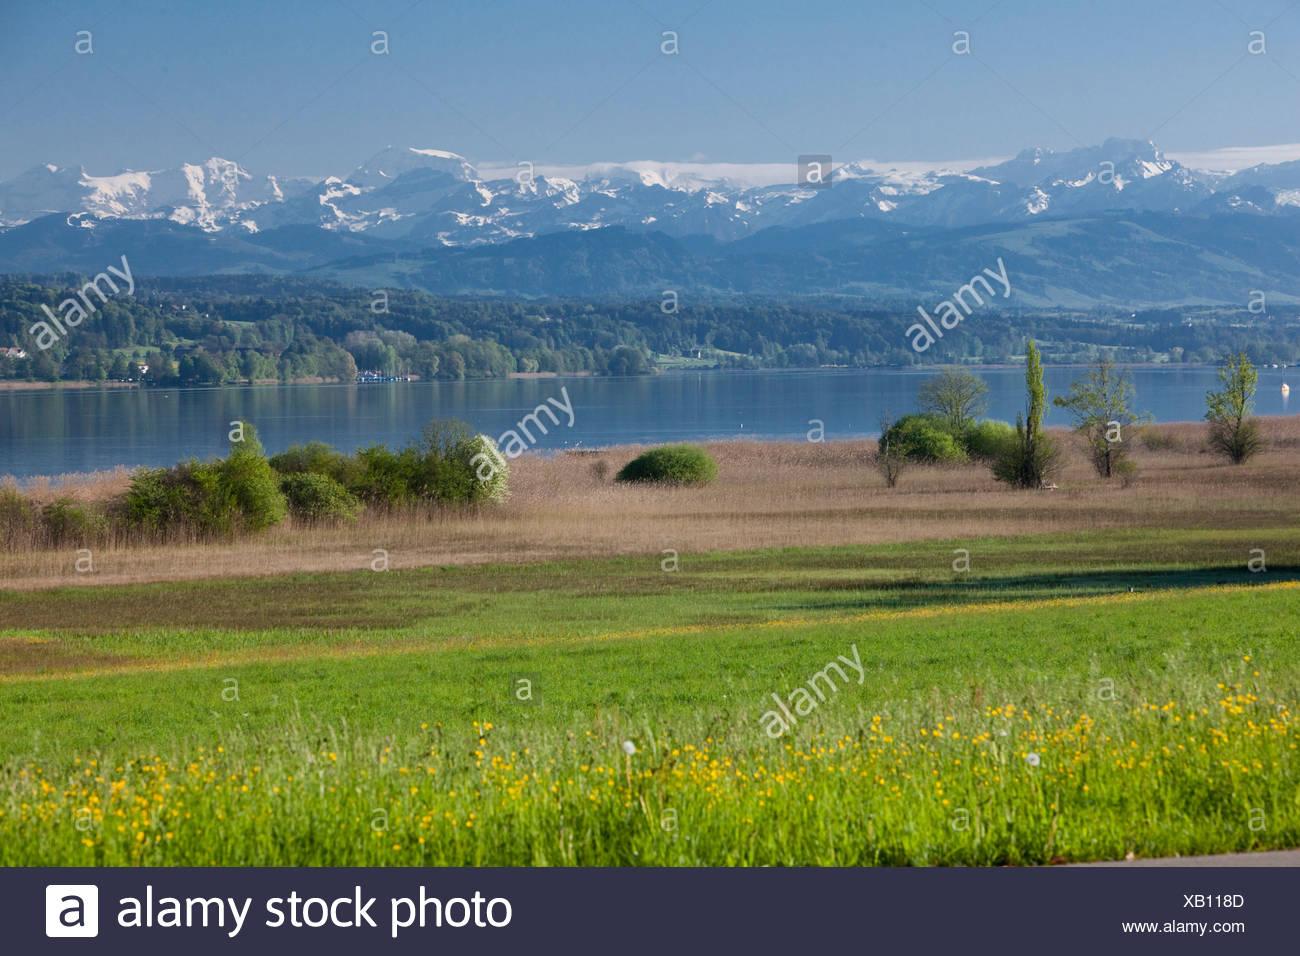 Switzerland, Europe, lake, ship, boat, ships, boats, Alps, canton, ZH, Zurich, spring, Greifensee, Lake Greifen, meadow, - Stock Image